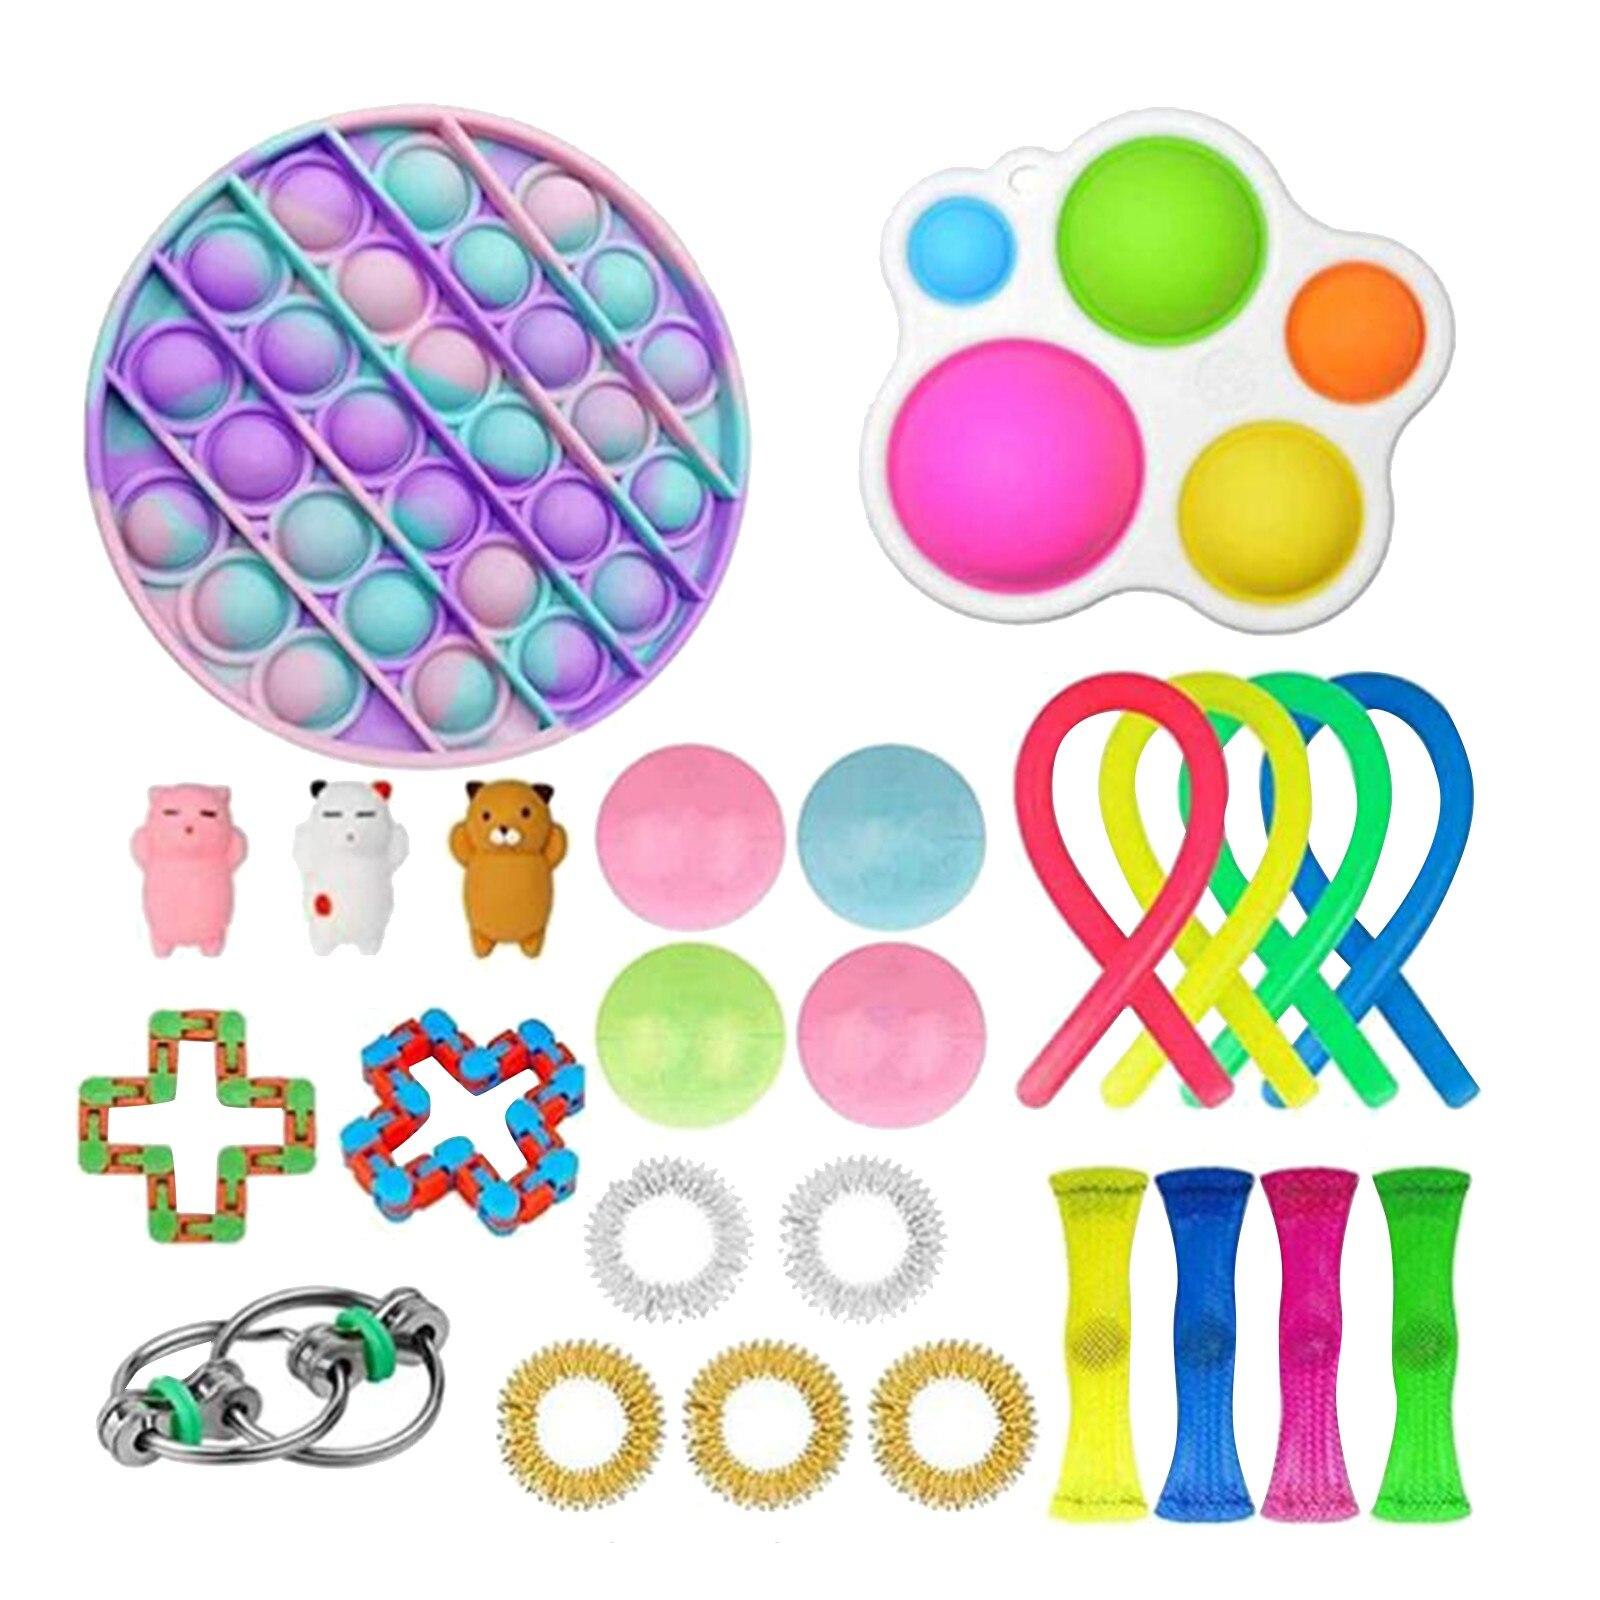 PopIt Round Push Bubble Fidget Toys Adult Stress Relief Toy Anti-stress PopIt Soft Squishy Anti-Stress Gift Anti-Stress Poppit img5